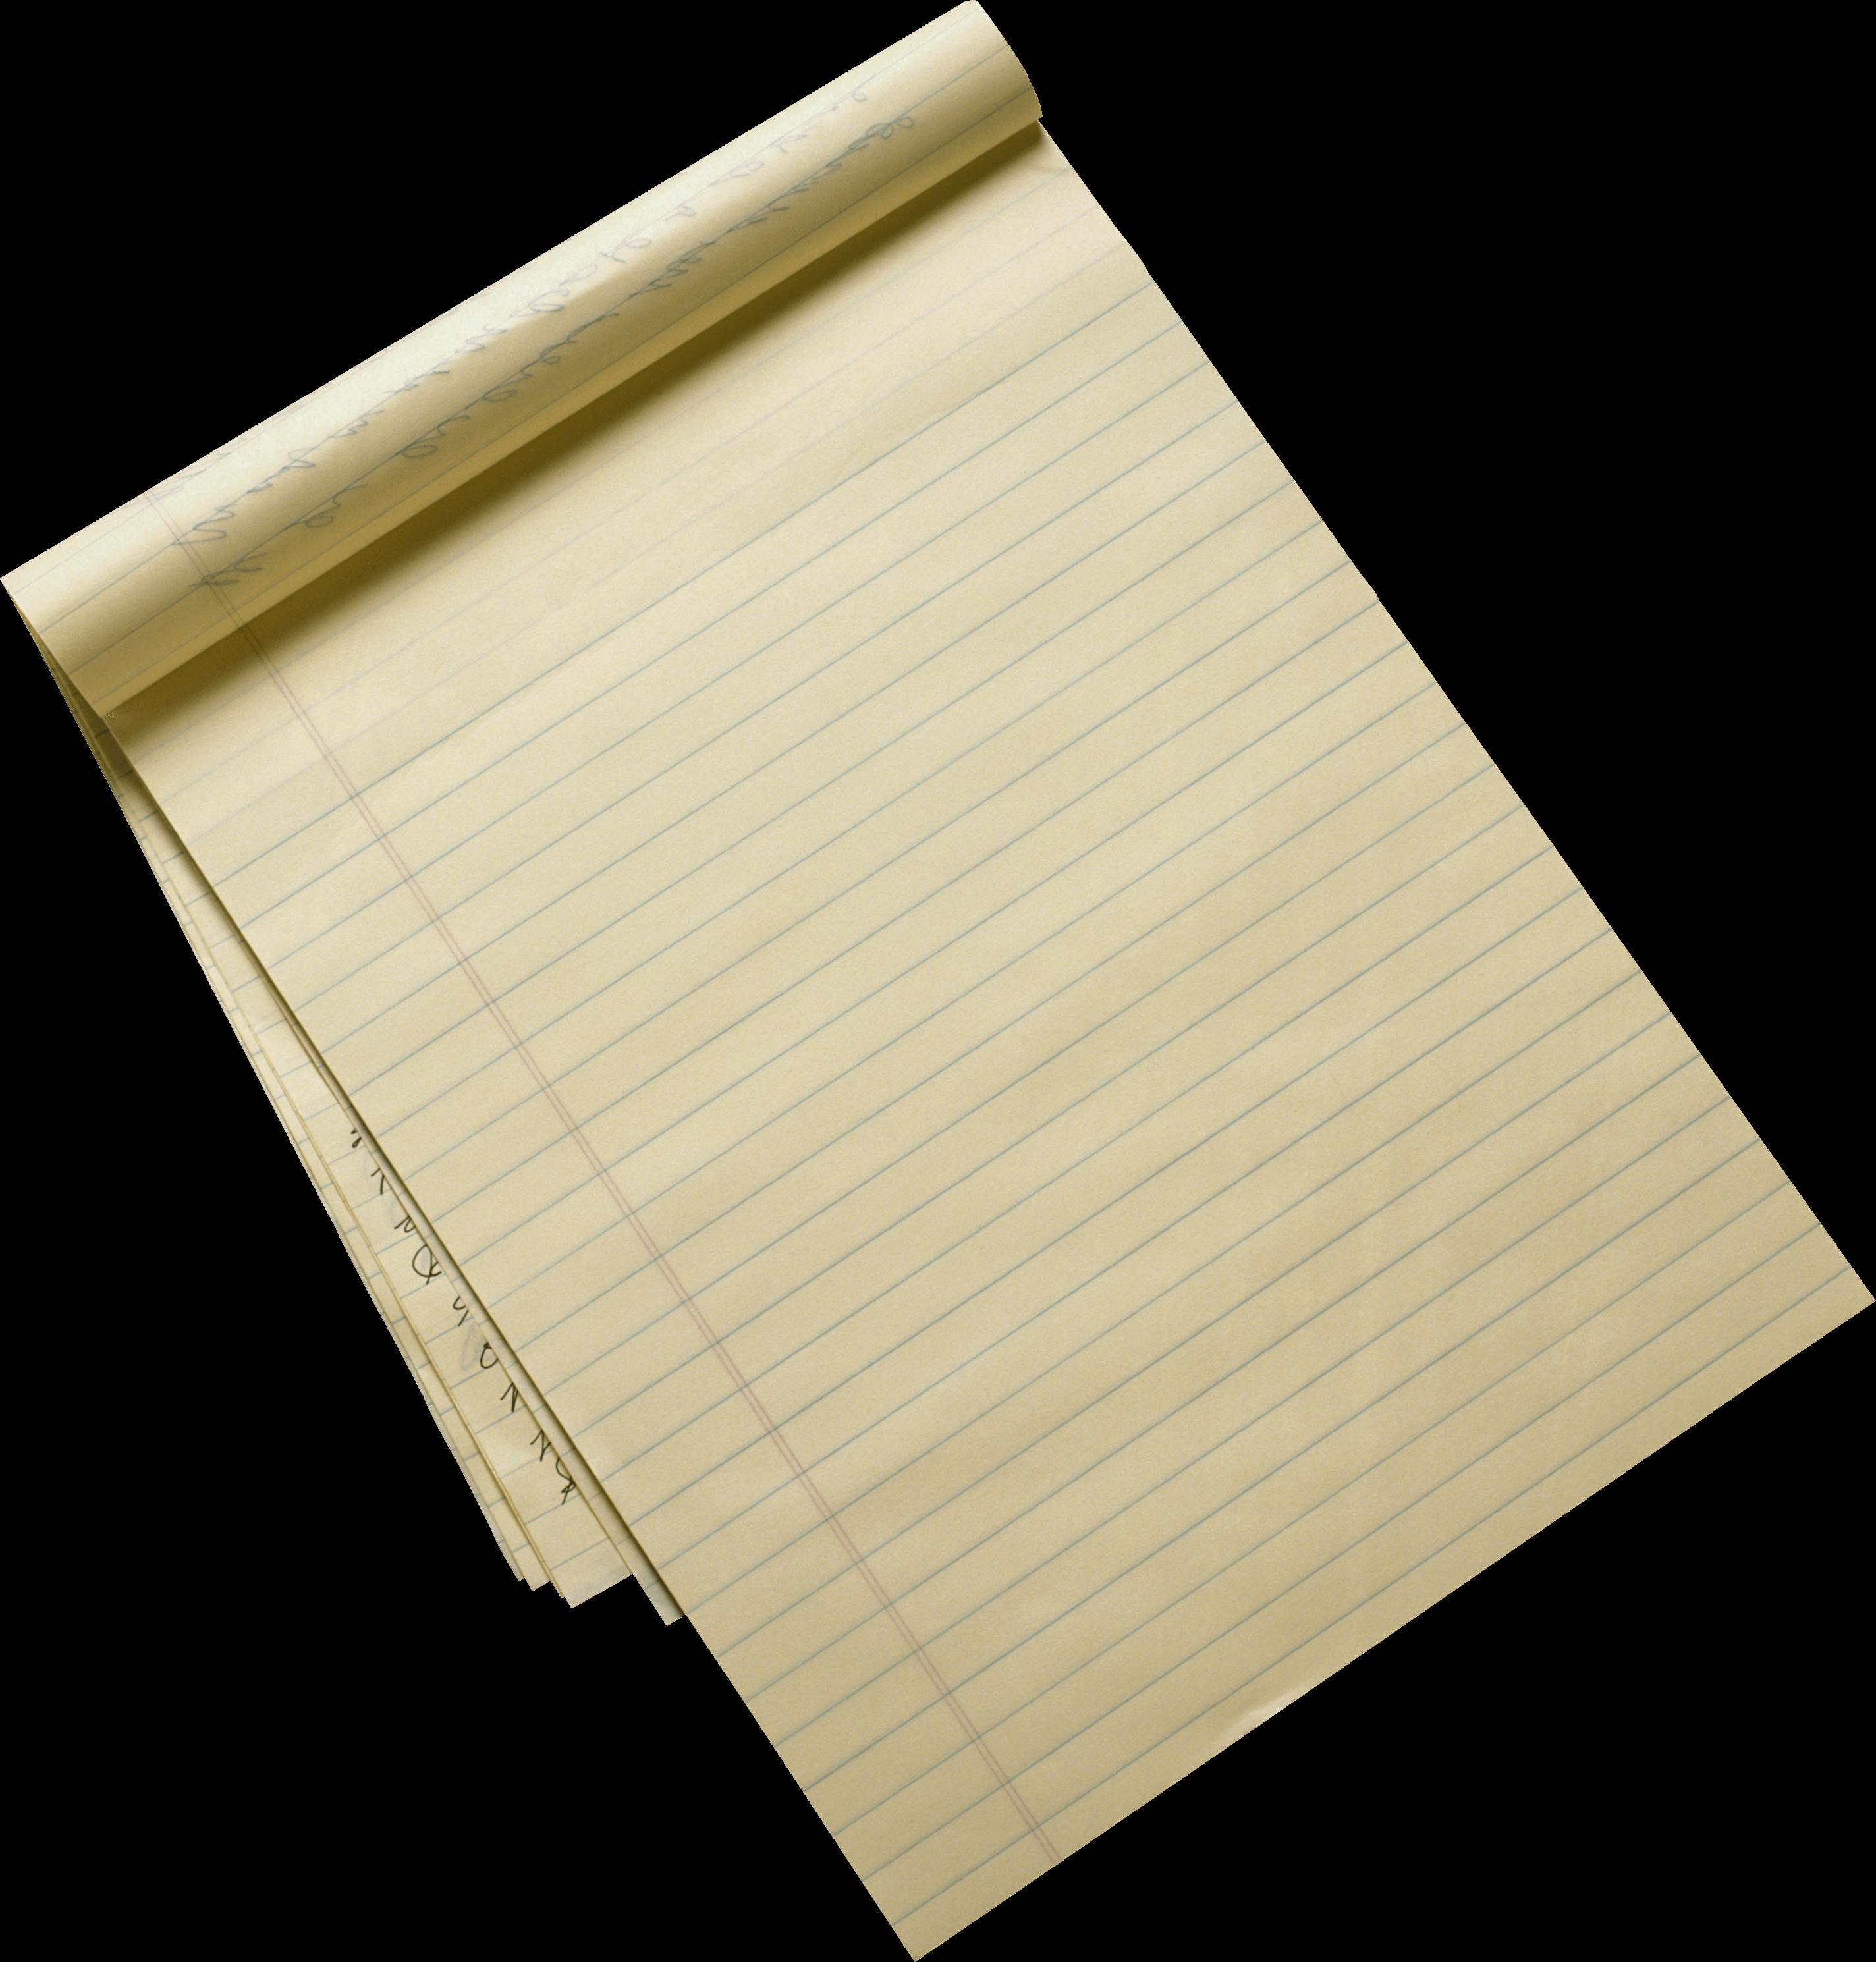 Pencil sheet transparent png. Paper clipart ruled paper